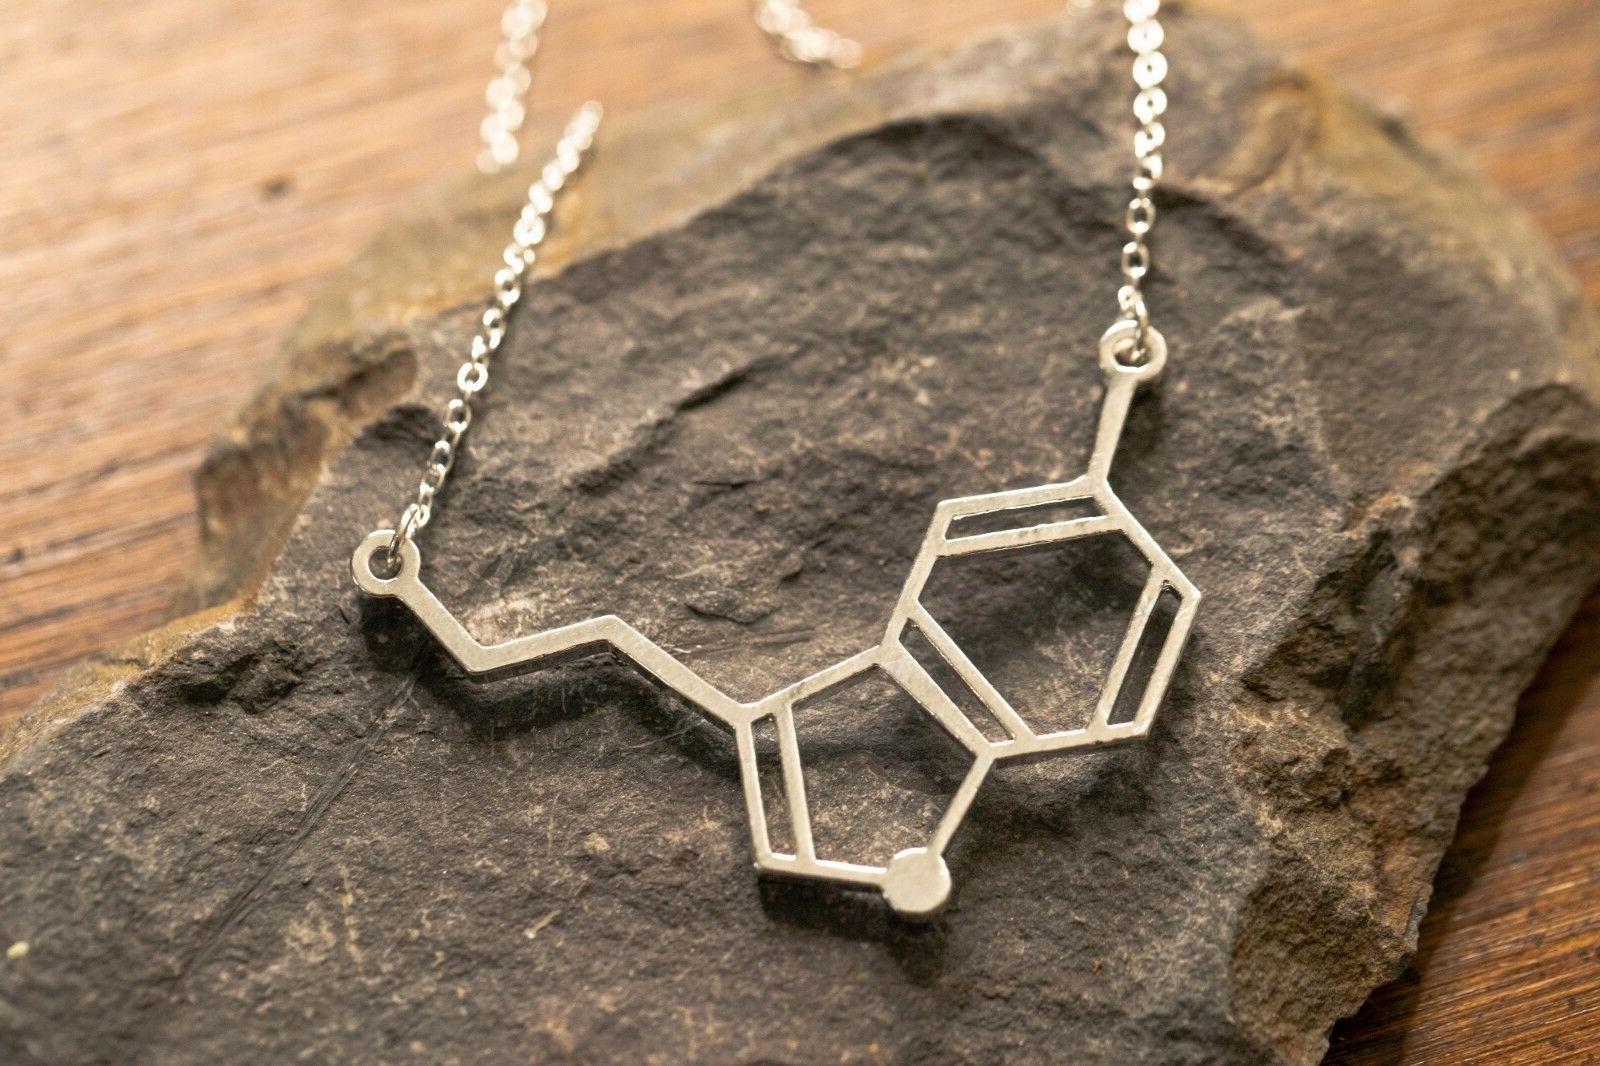 serotonin molecule pendant necklace gift for her